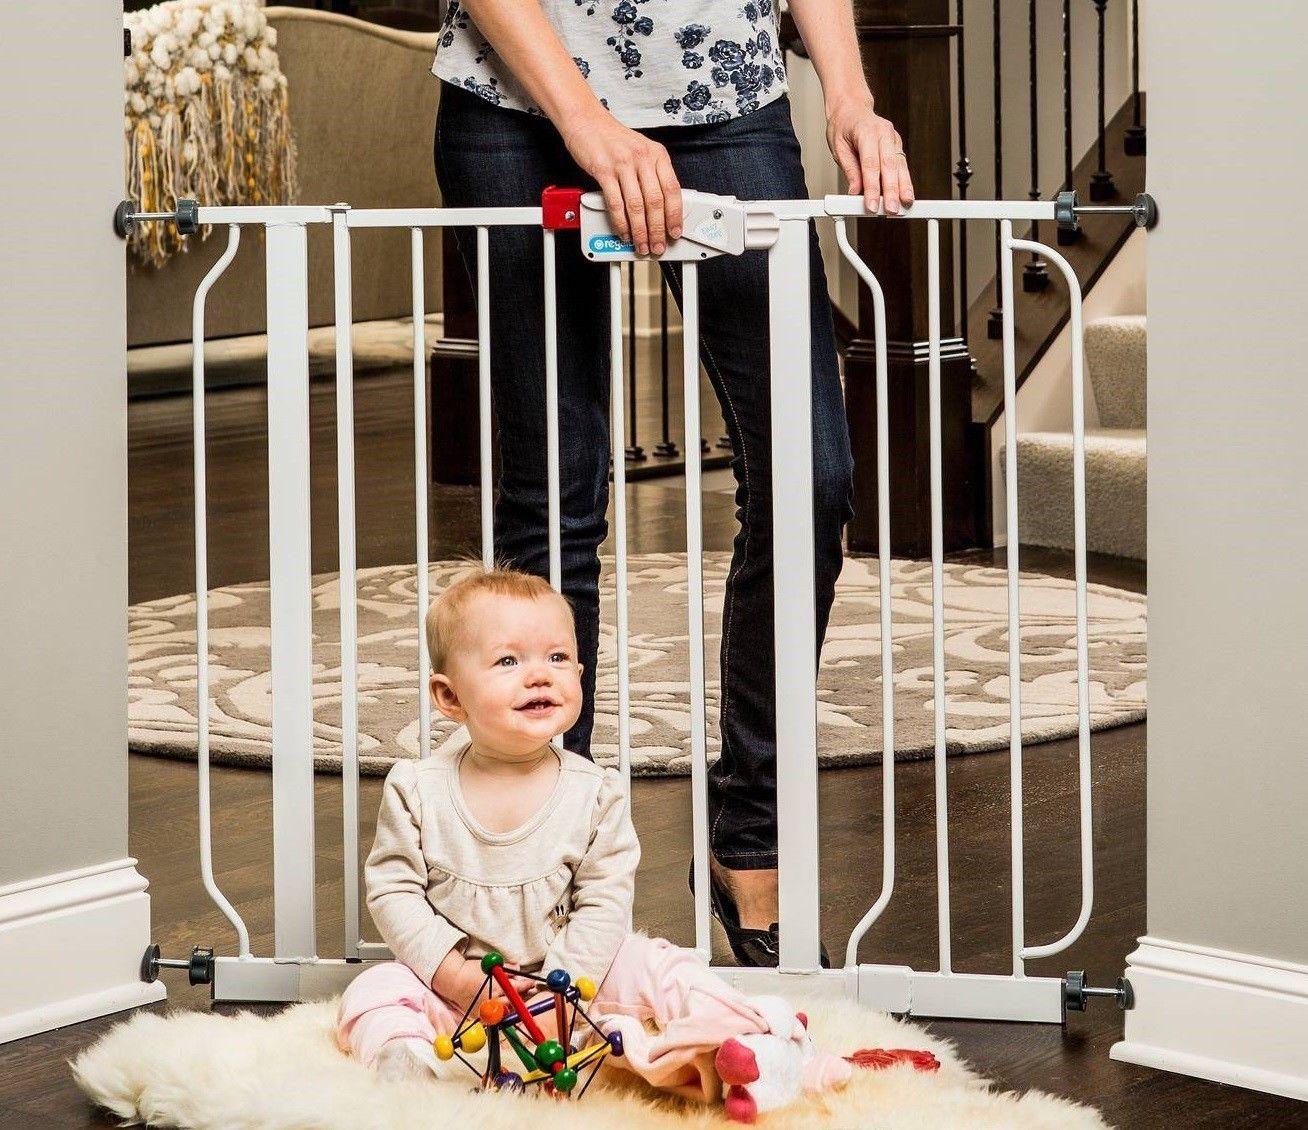 Easy step walk thru gate white fits spaces safety lock